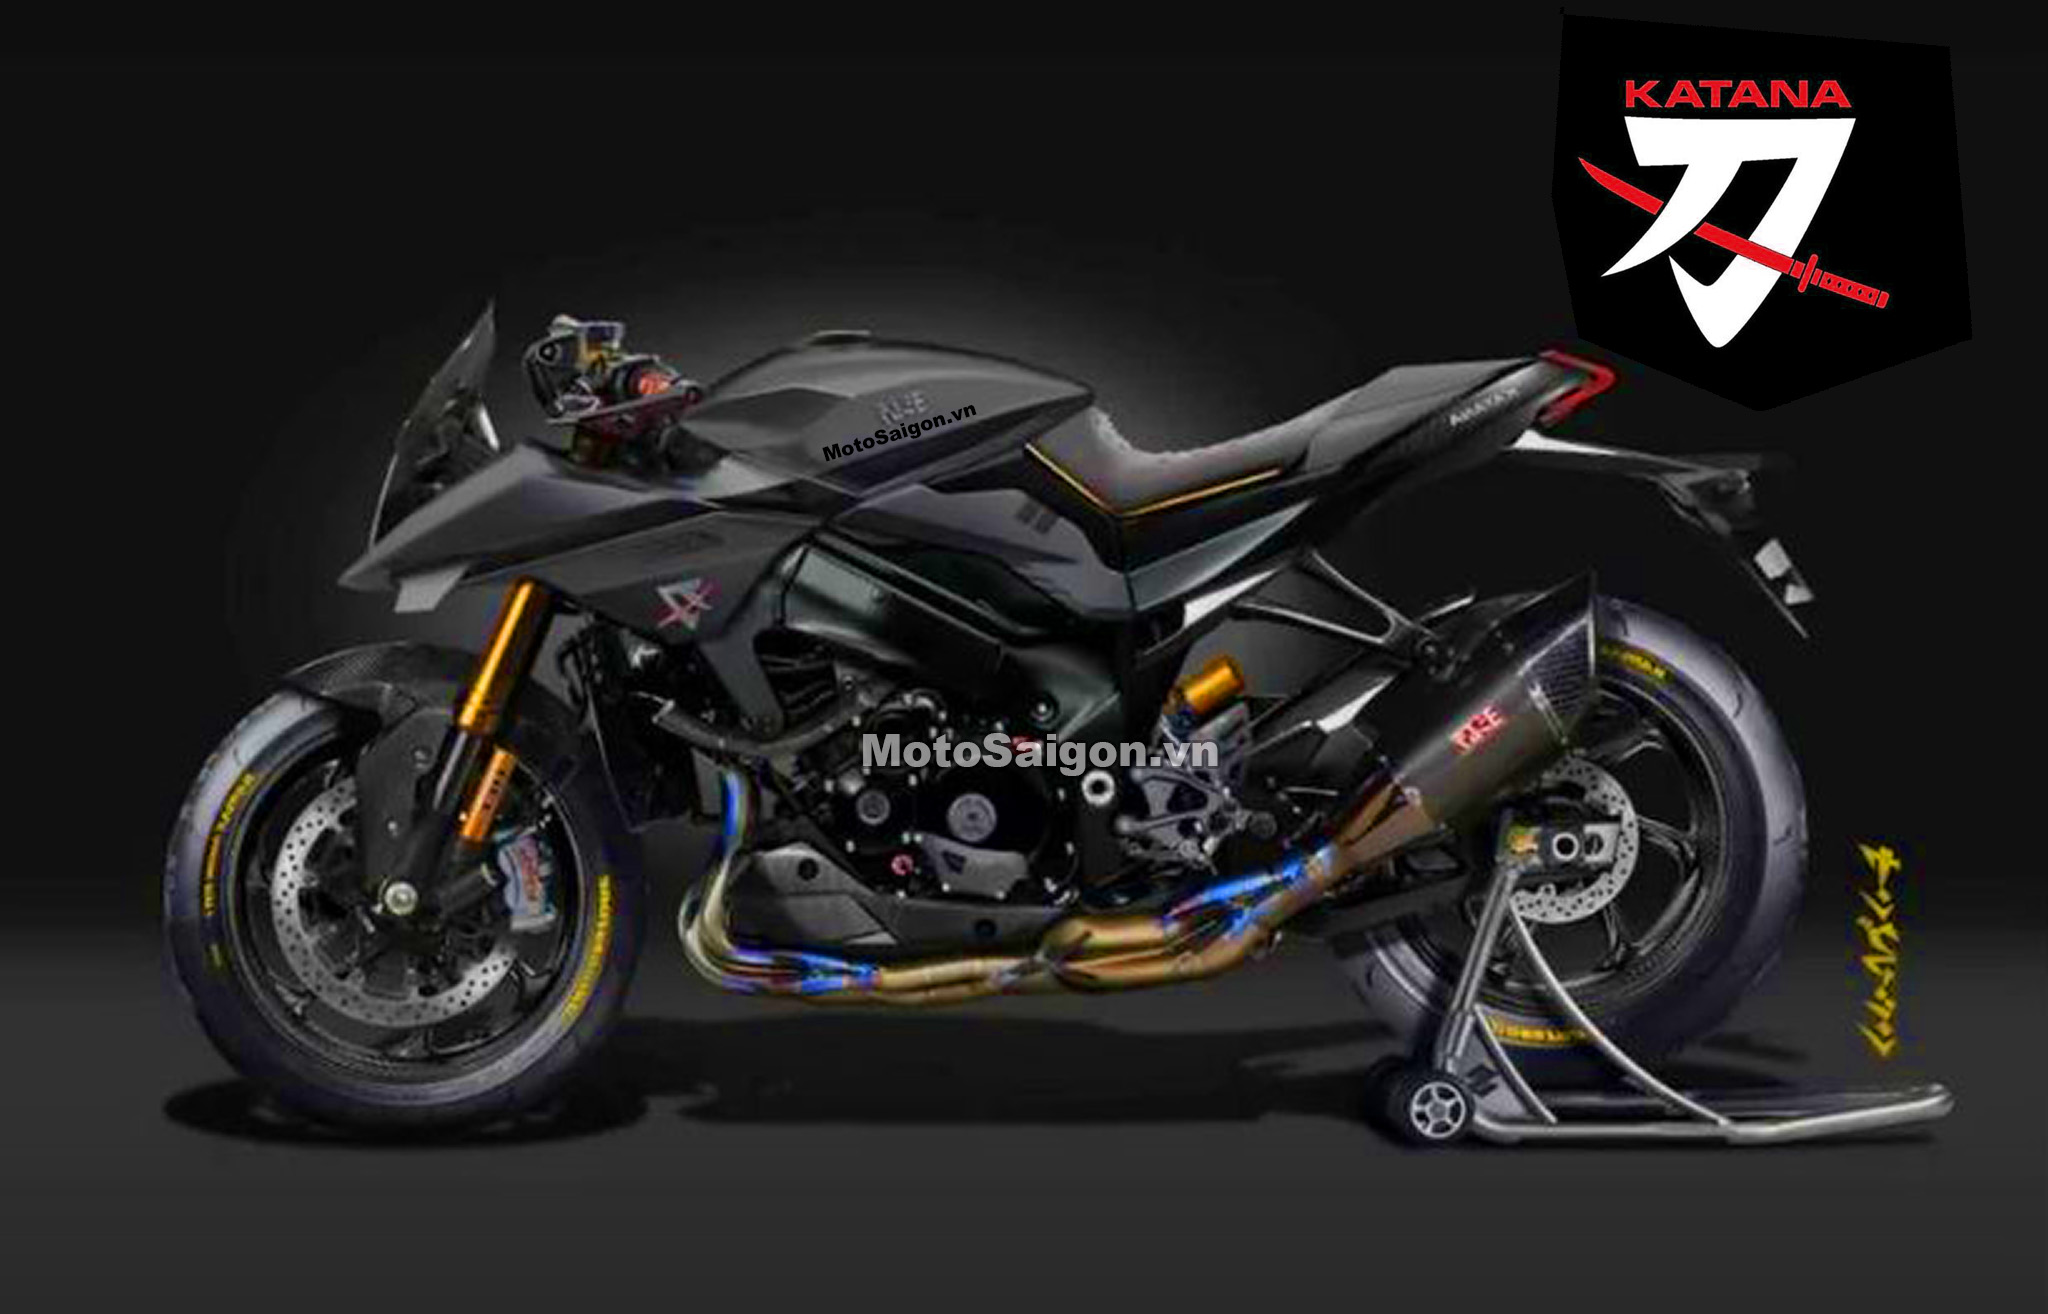 Suzuki Katana R hình ảnh concept